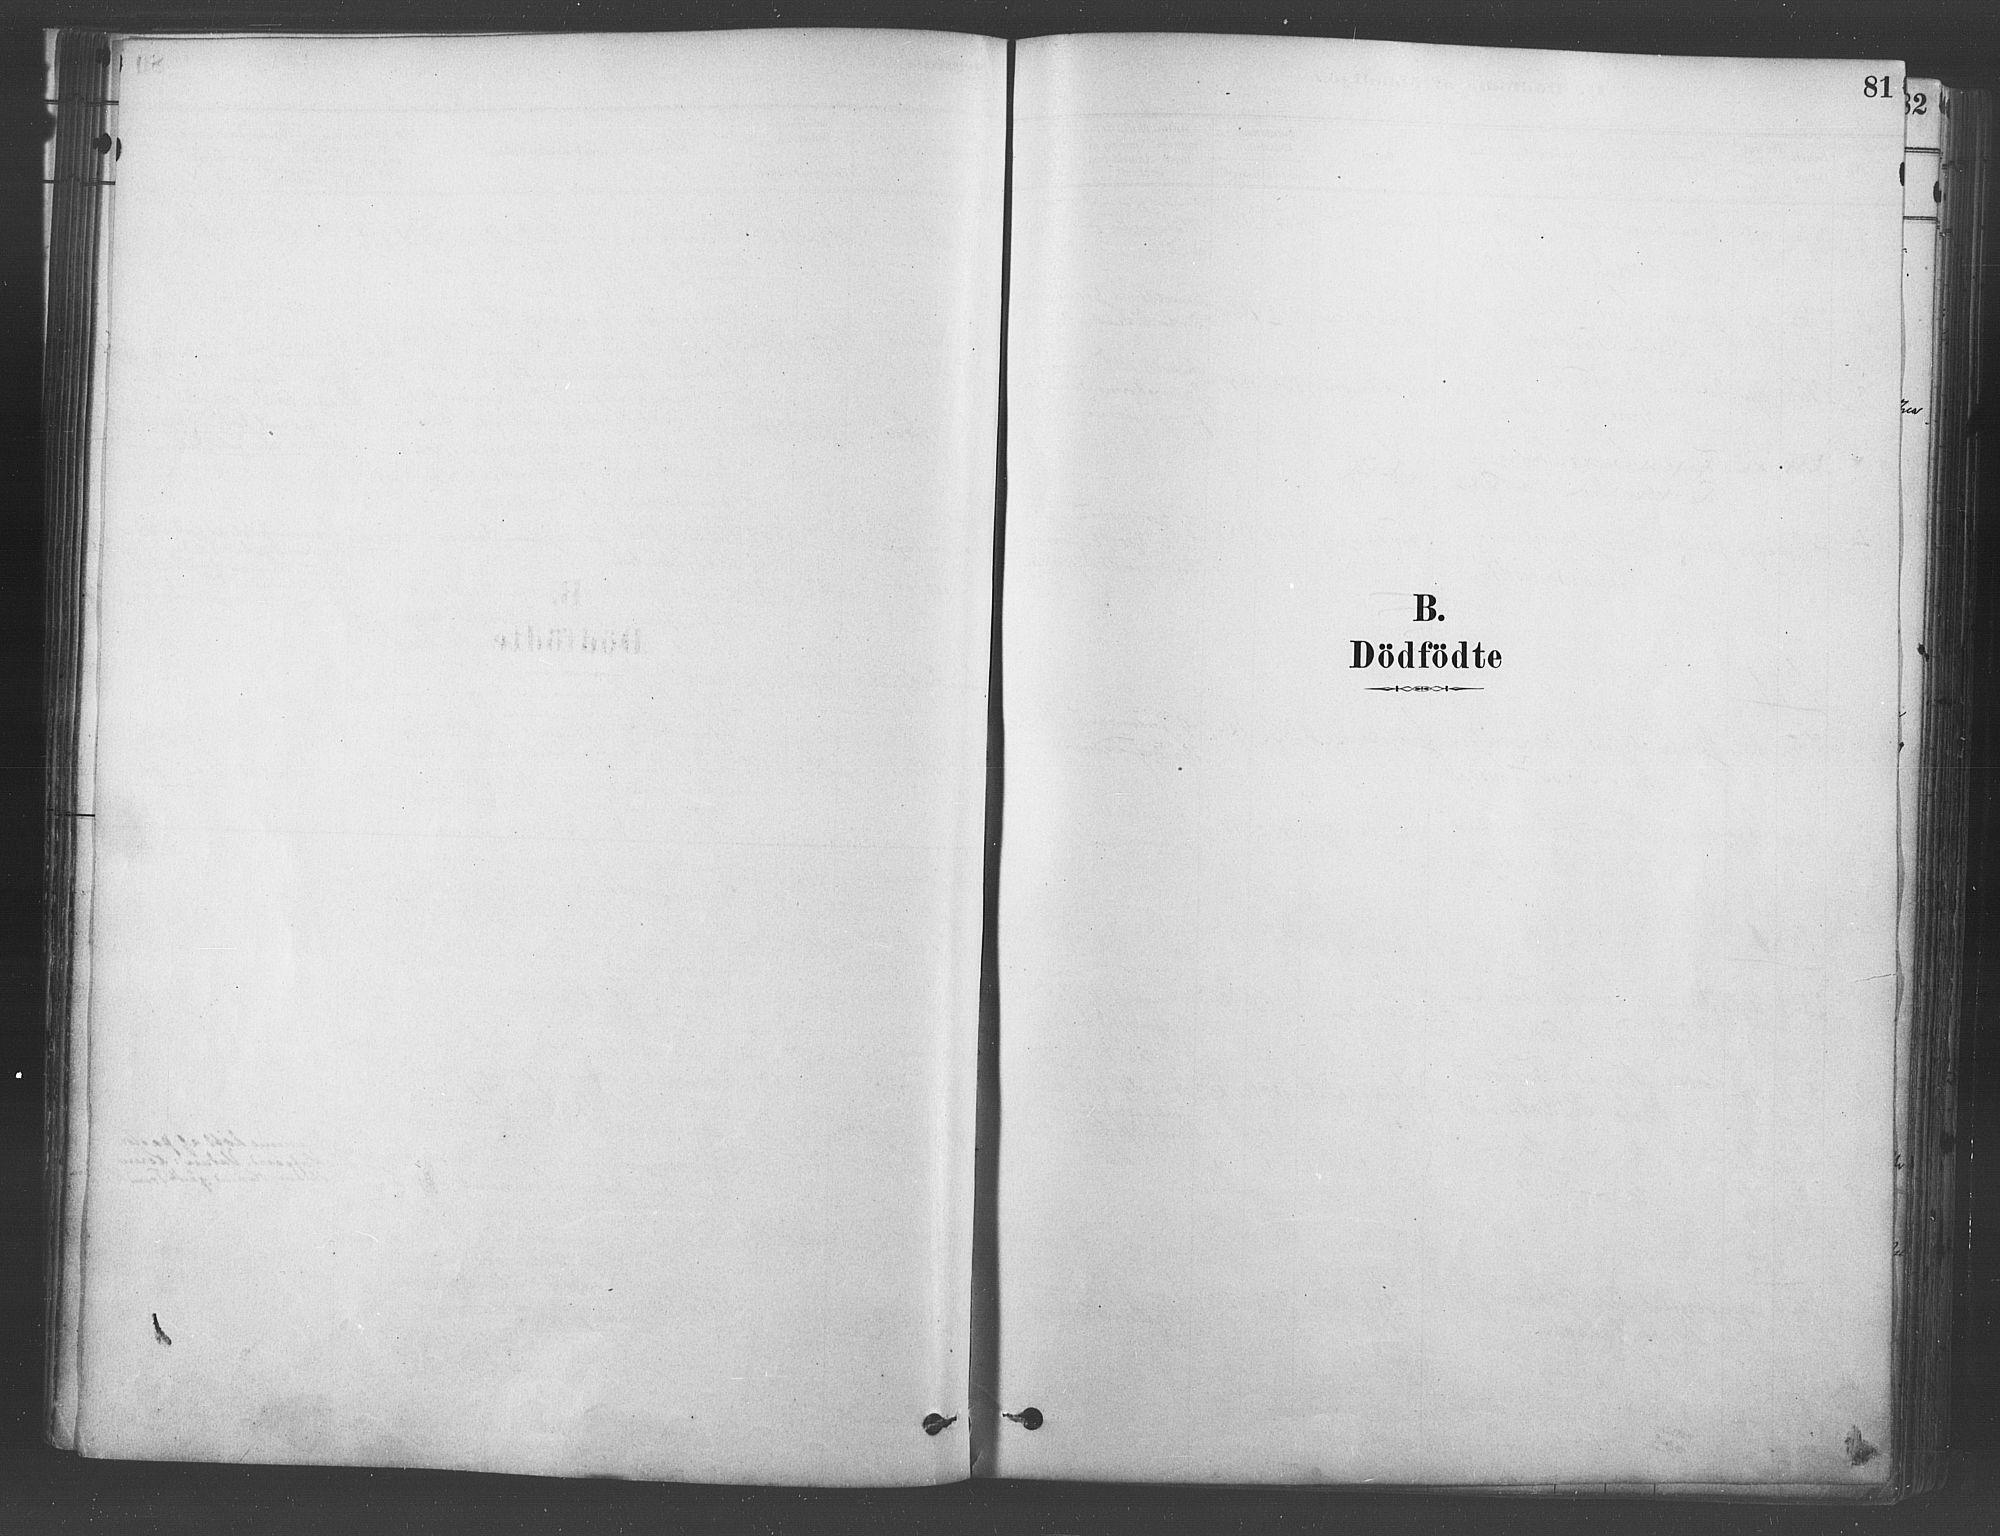 SAO, Ullensaker prestekontor Kirkebøker, F/Fb/L0001: Ministerialbok nr. II 1, 1878-1893, s. 81